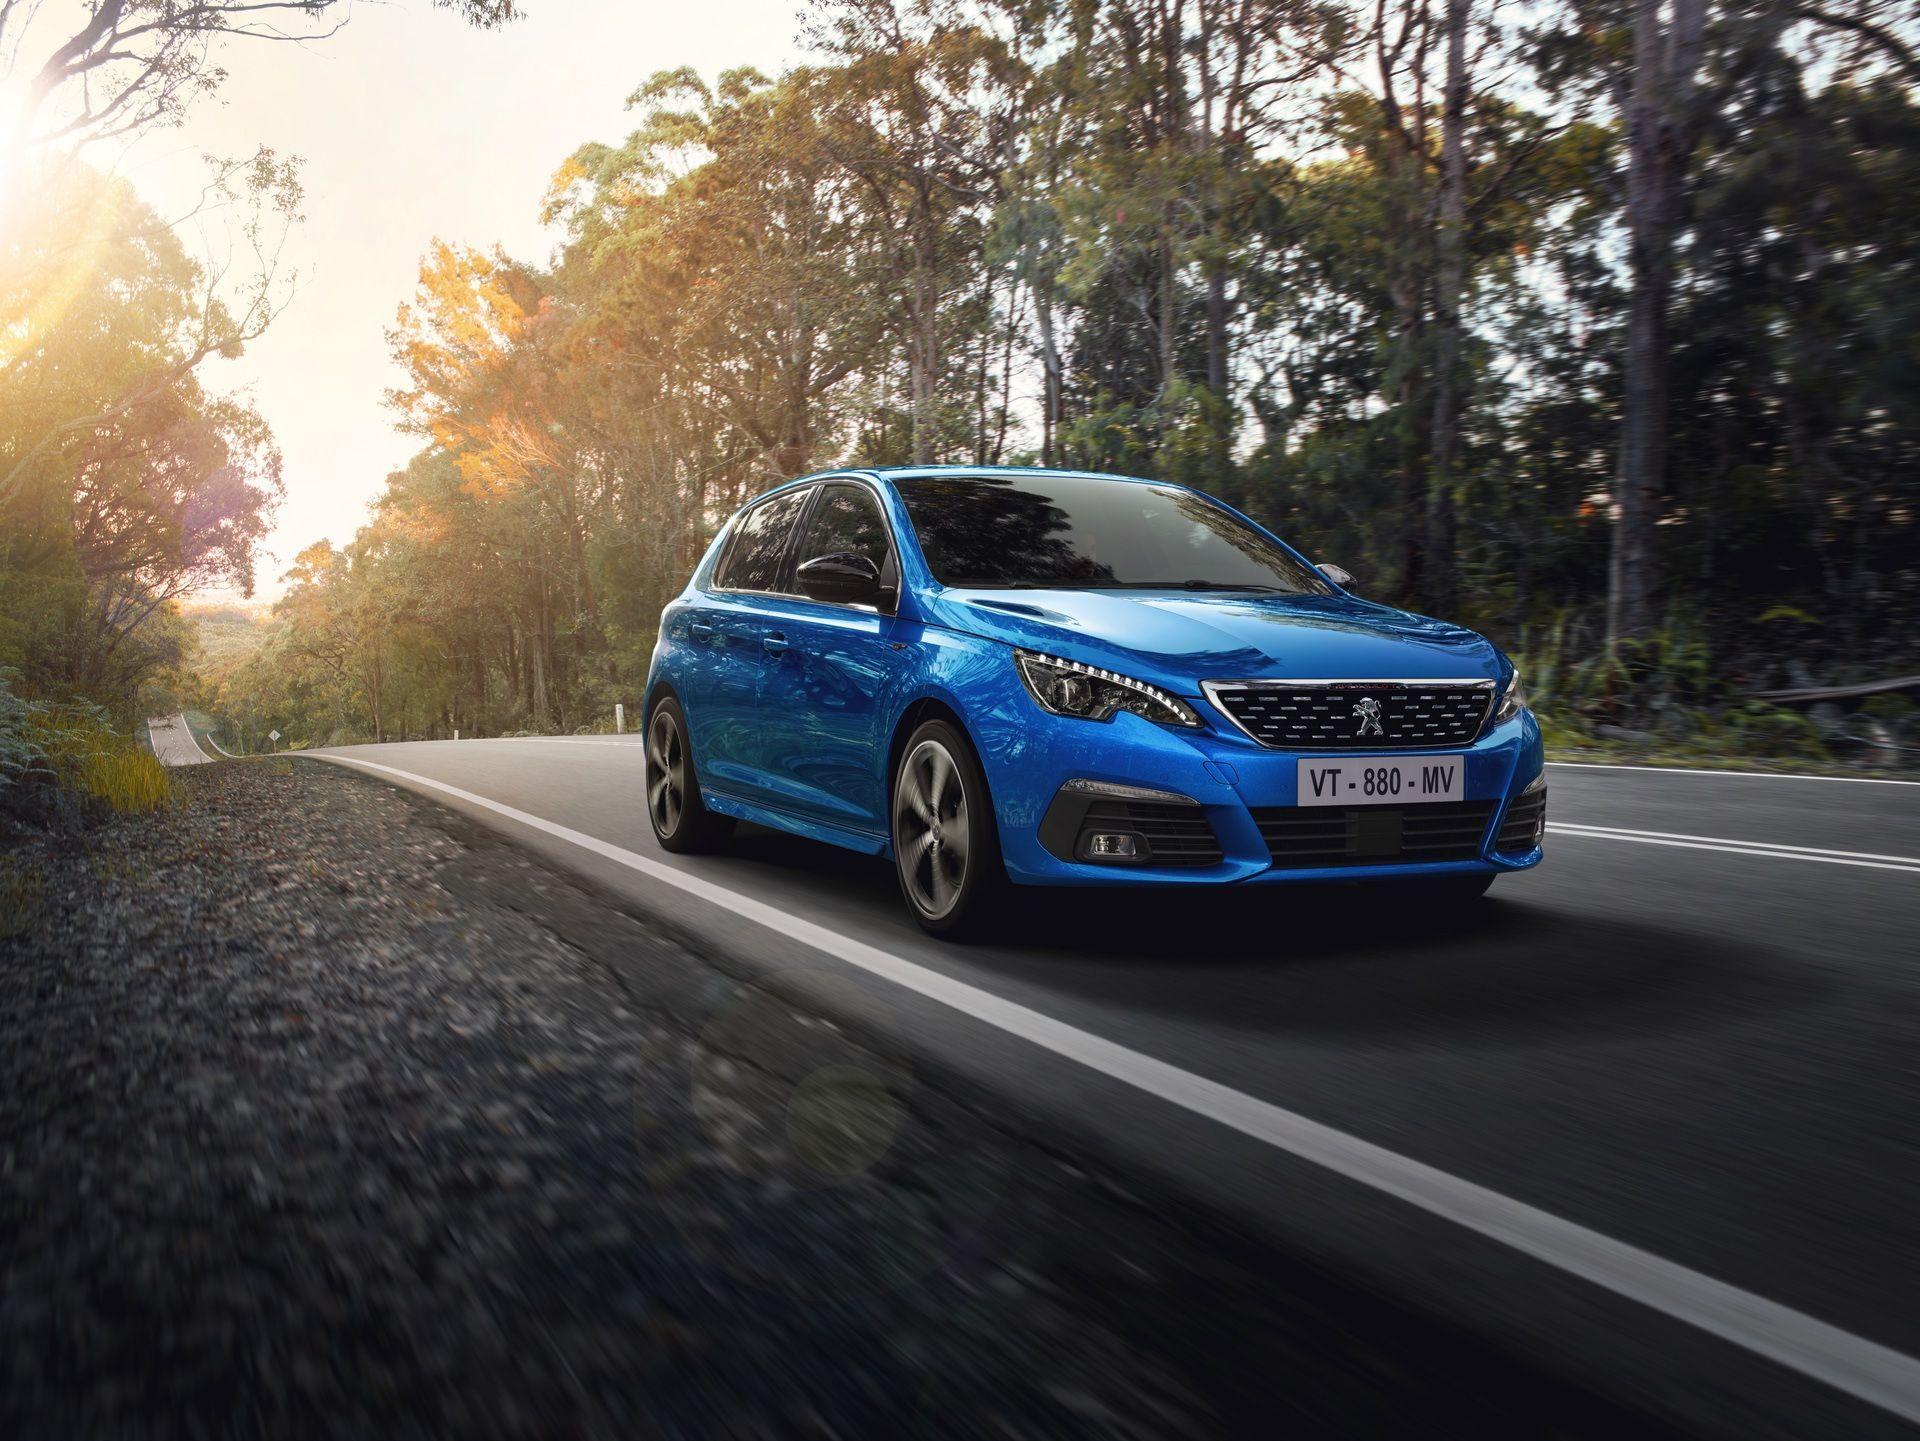 2020_Peugeot_308_facelift_0015